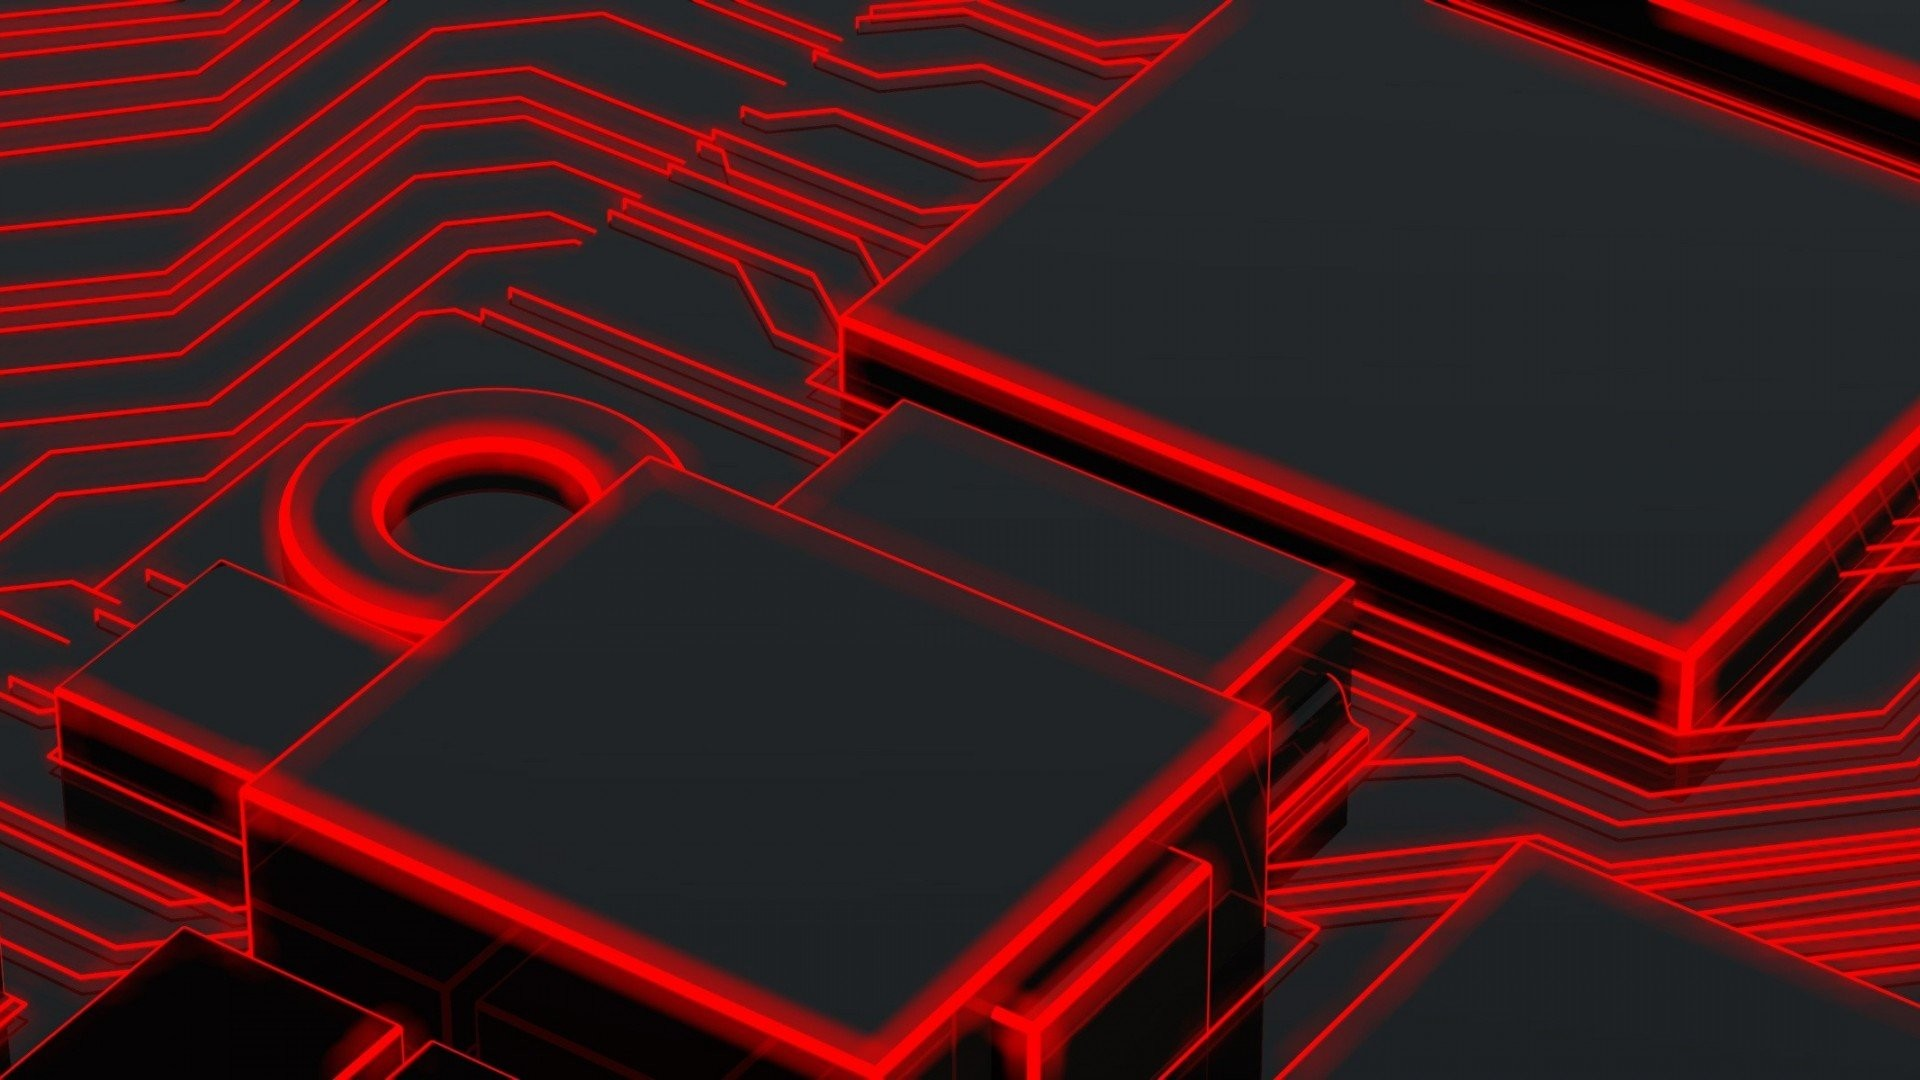 Red Razer Wallpaper HD – WallpaperSafari